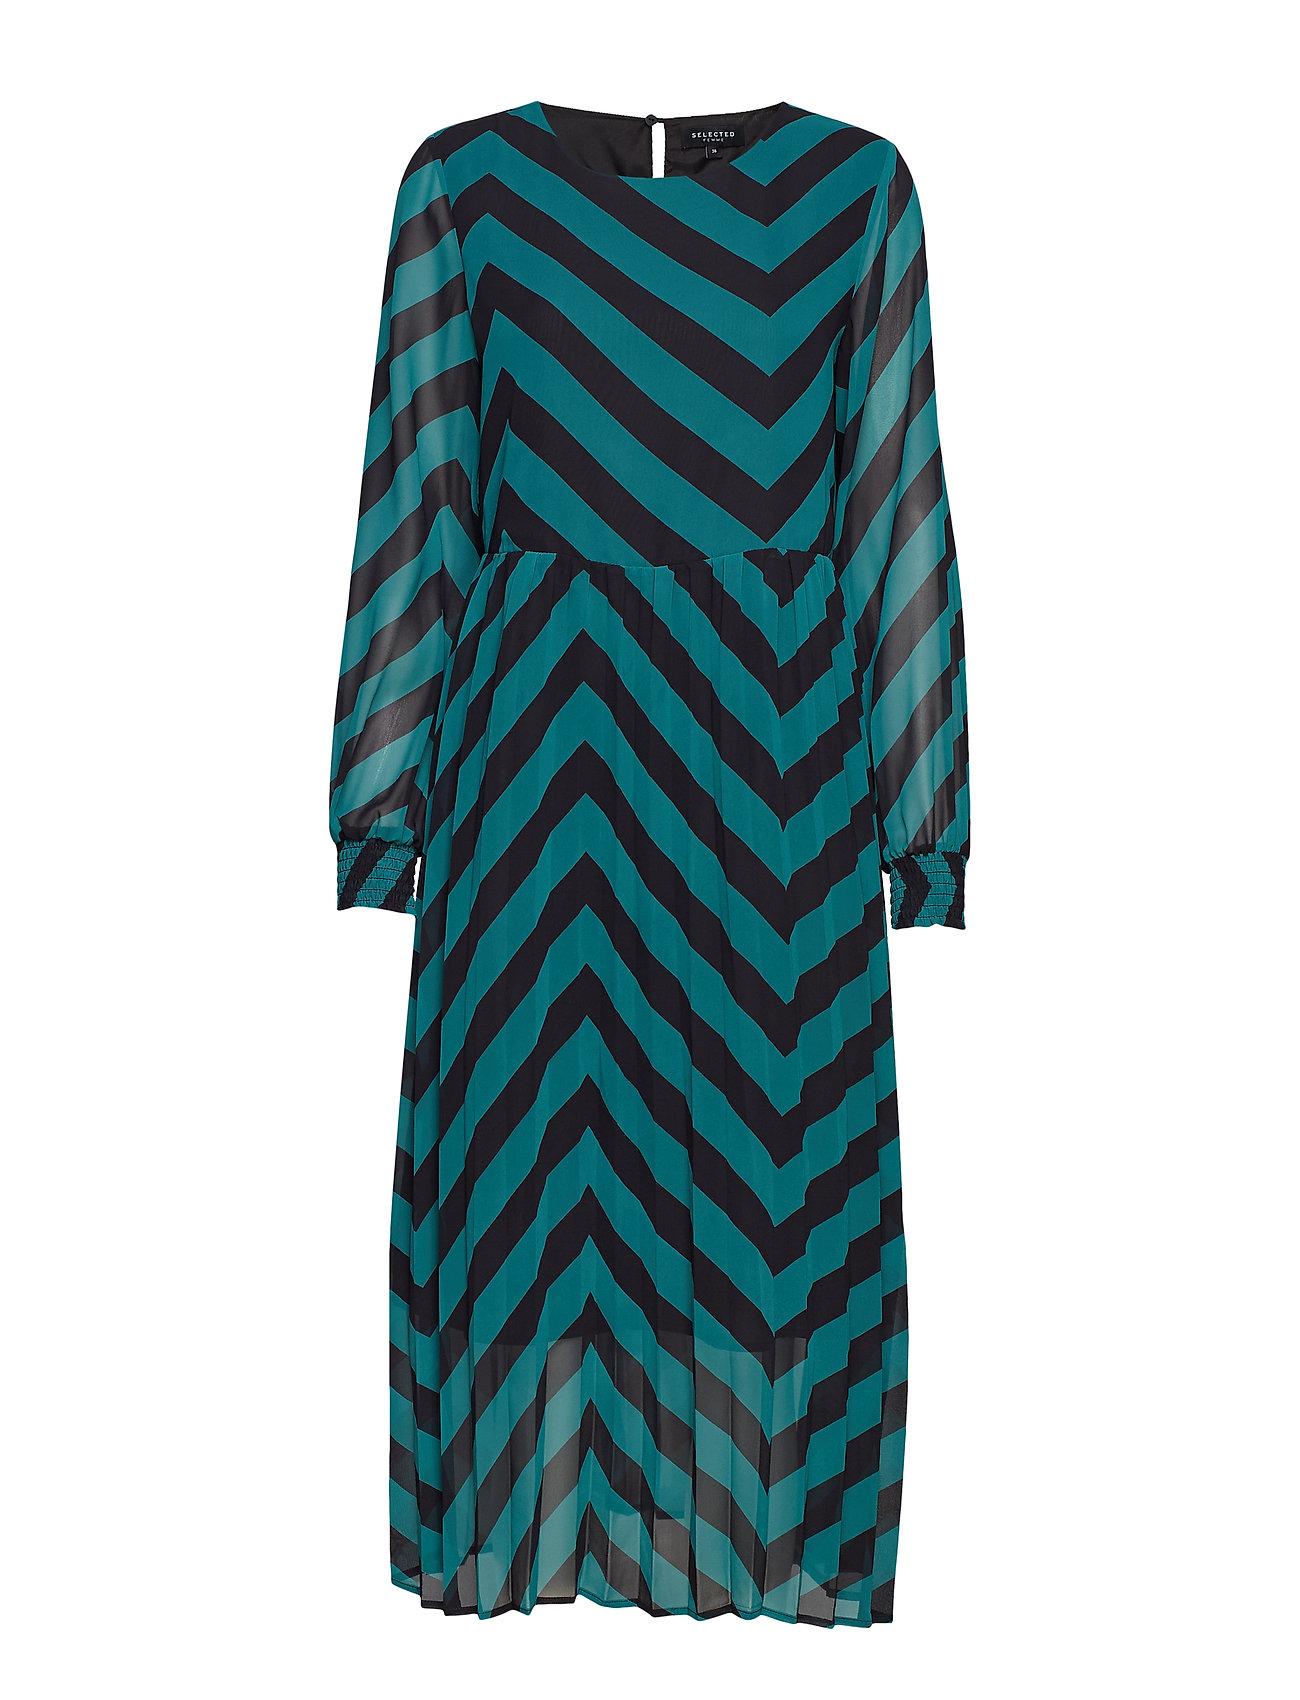 Selected Femme SLFELLA LS PLISSE DRESS EX - TEAL GREEN